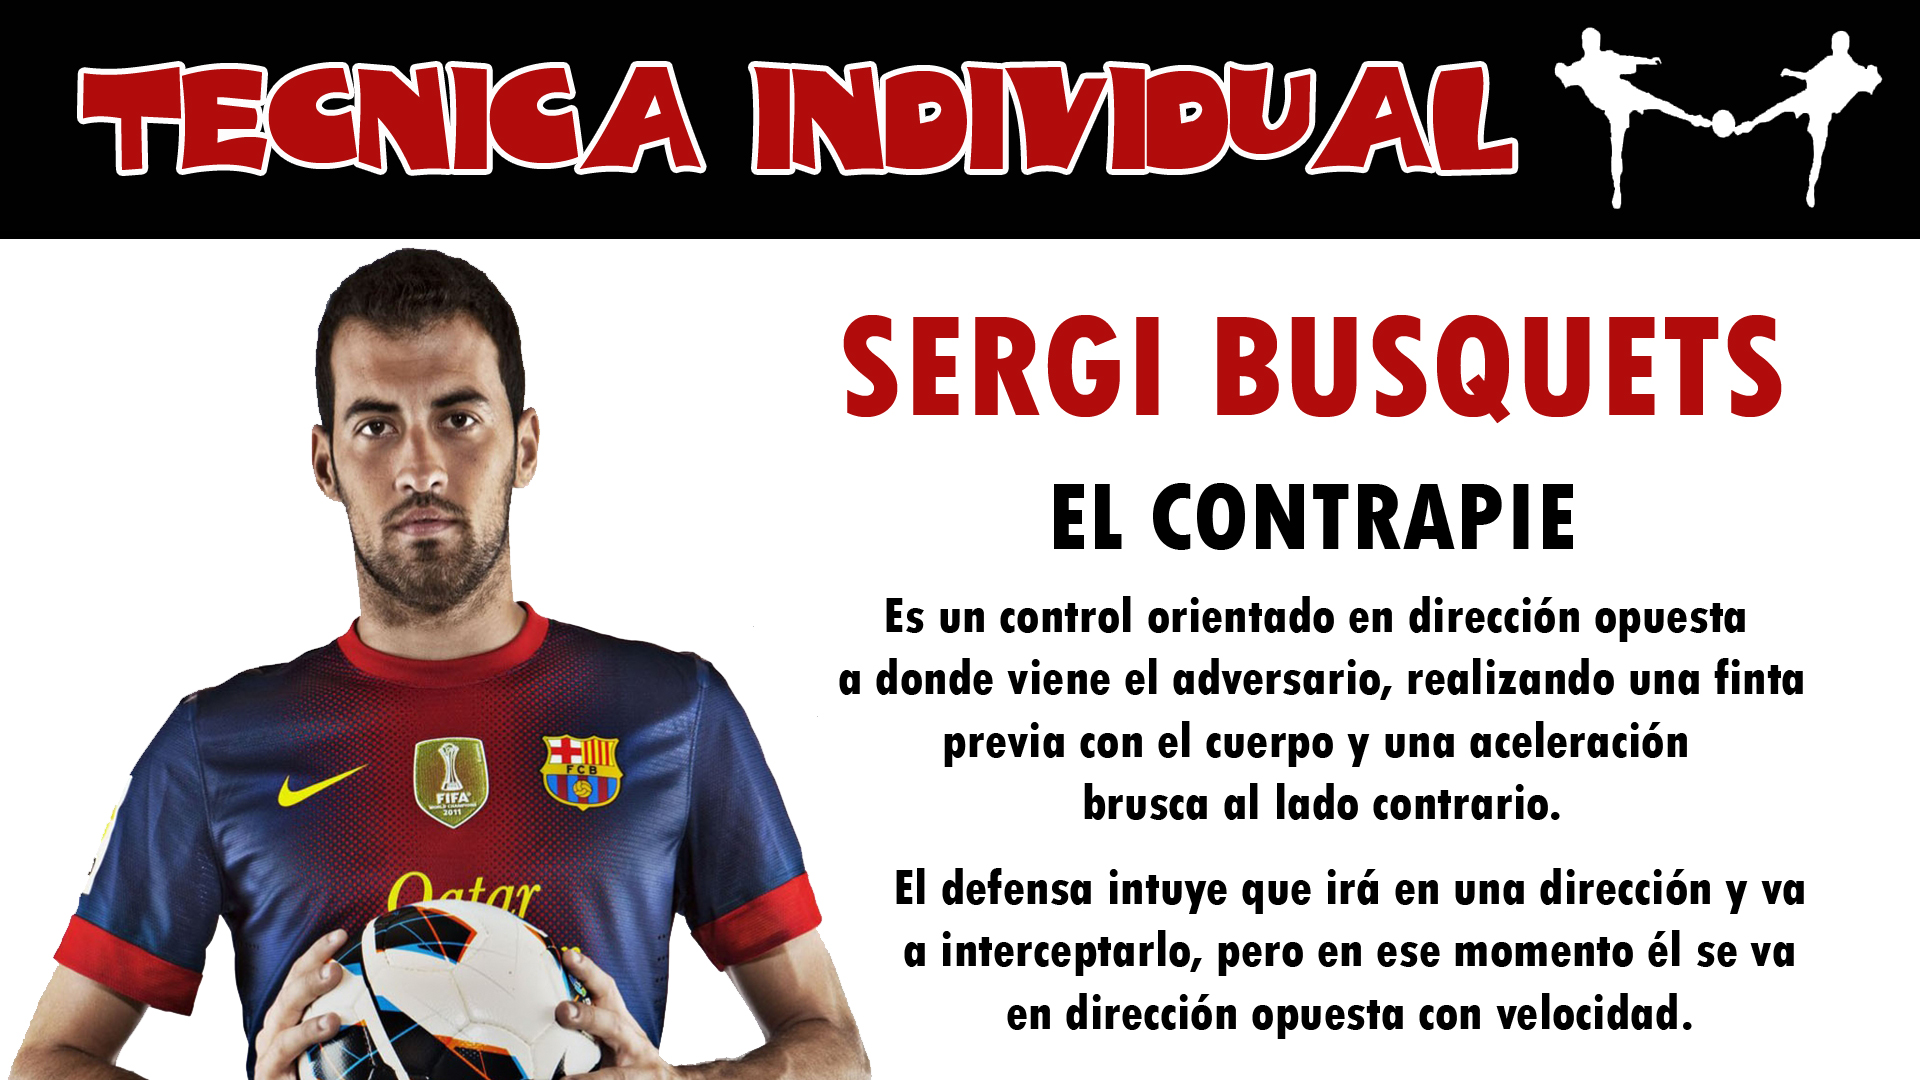 futbolcarrasco sergi busquet analisis tecnico fc barcelona contrapie dimas david